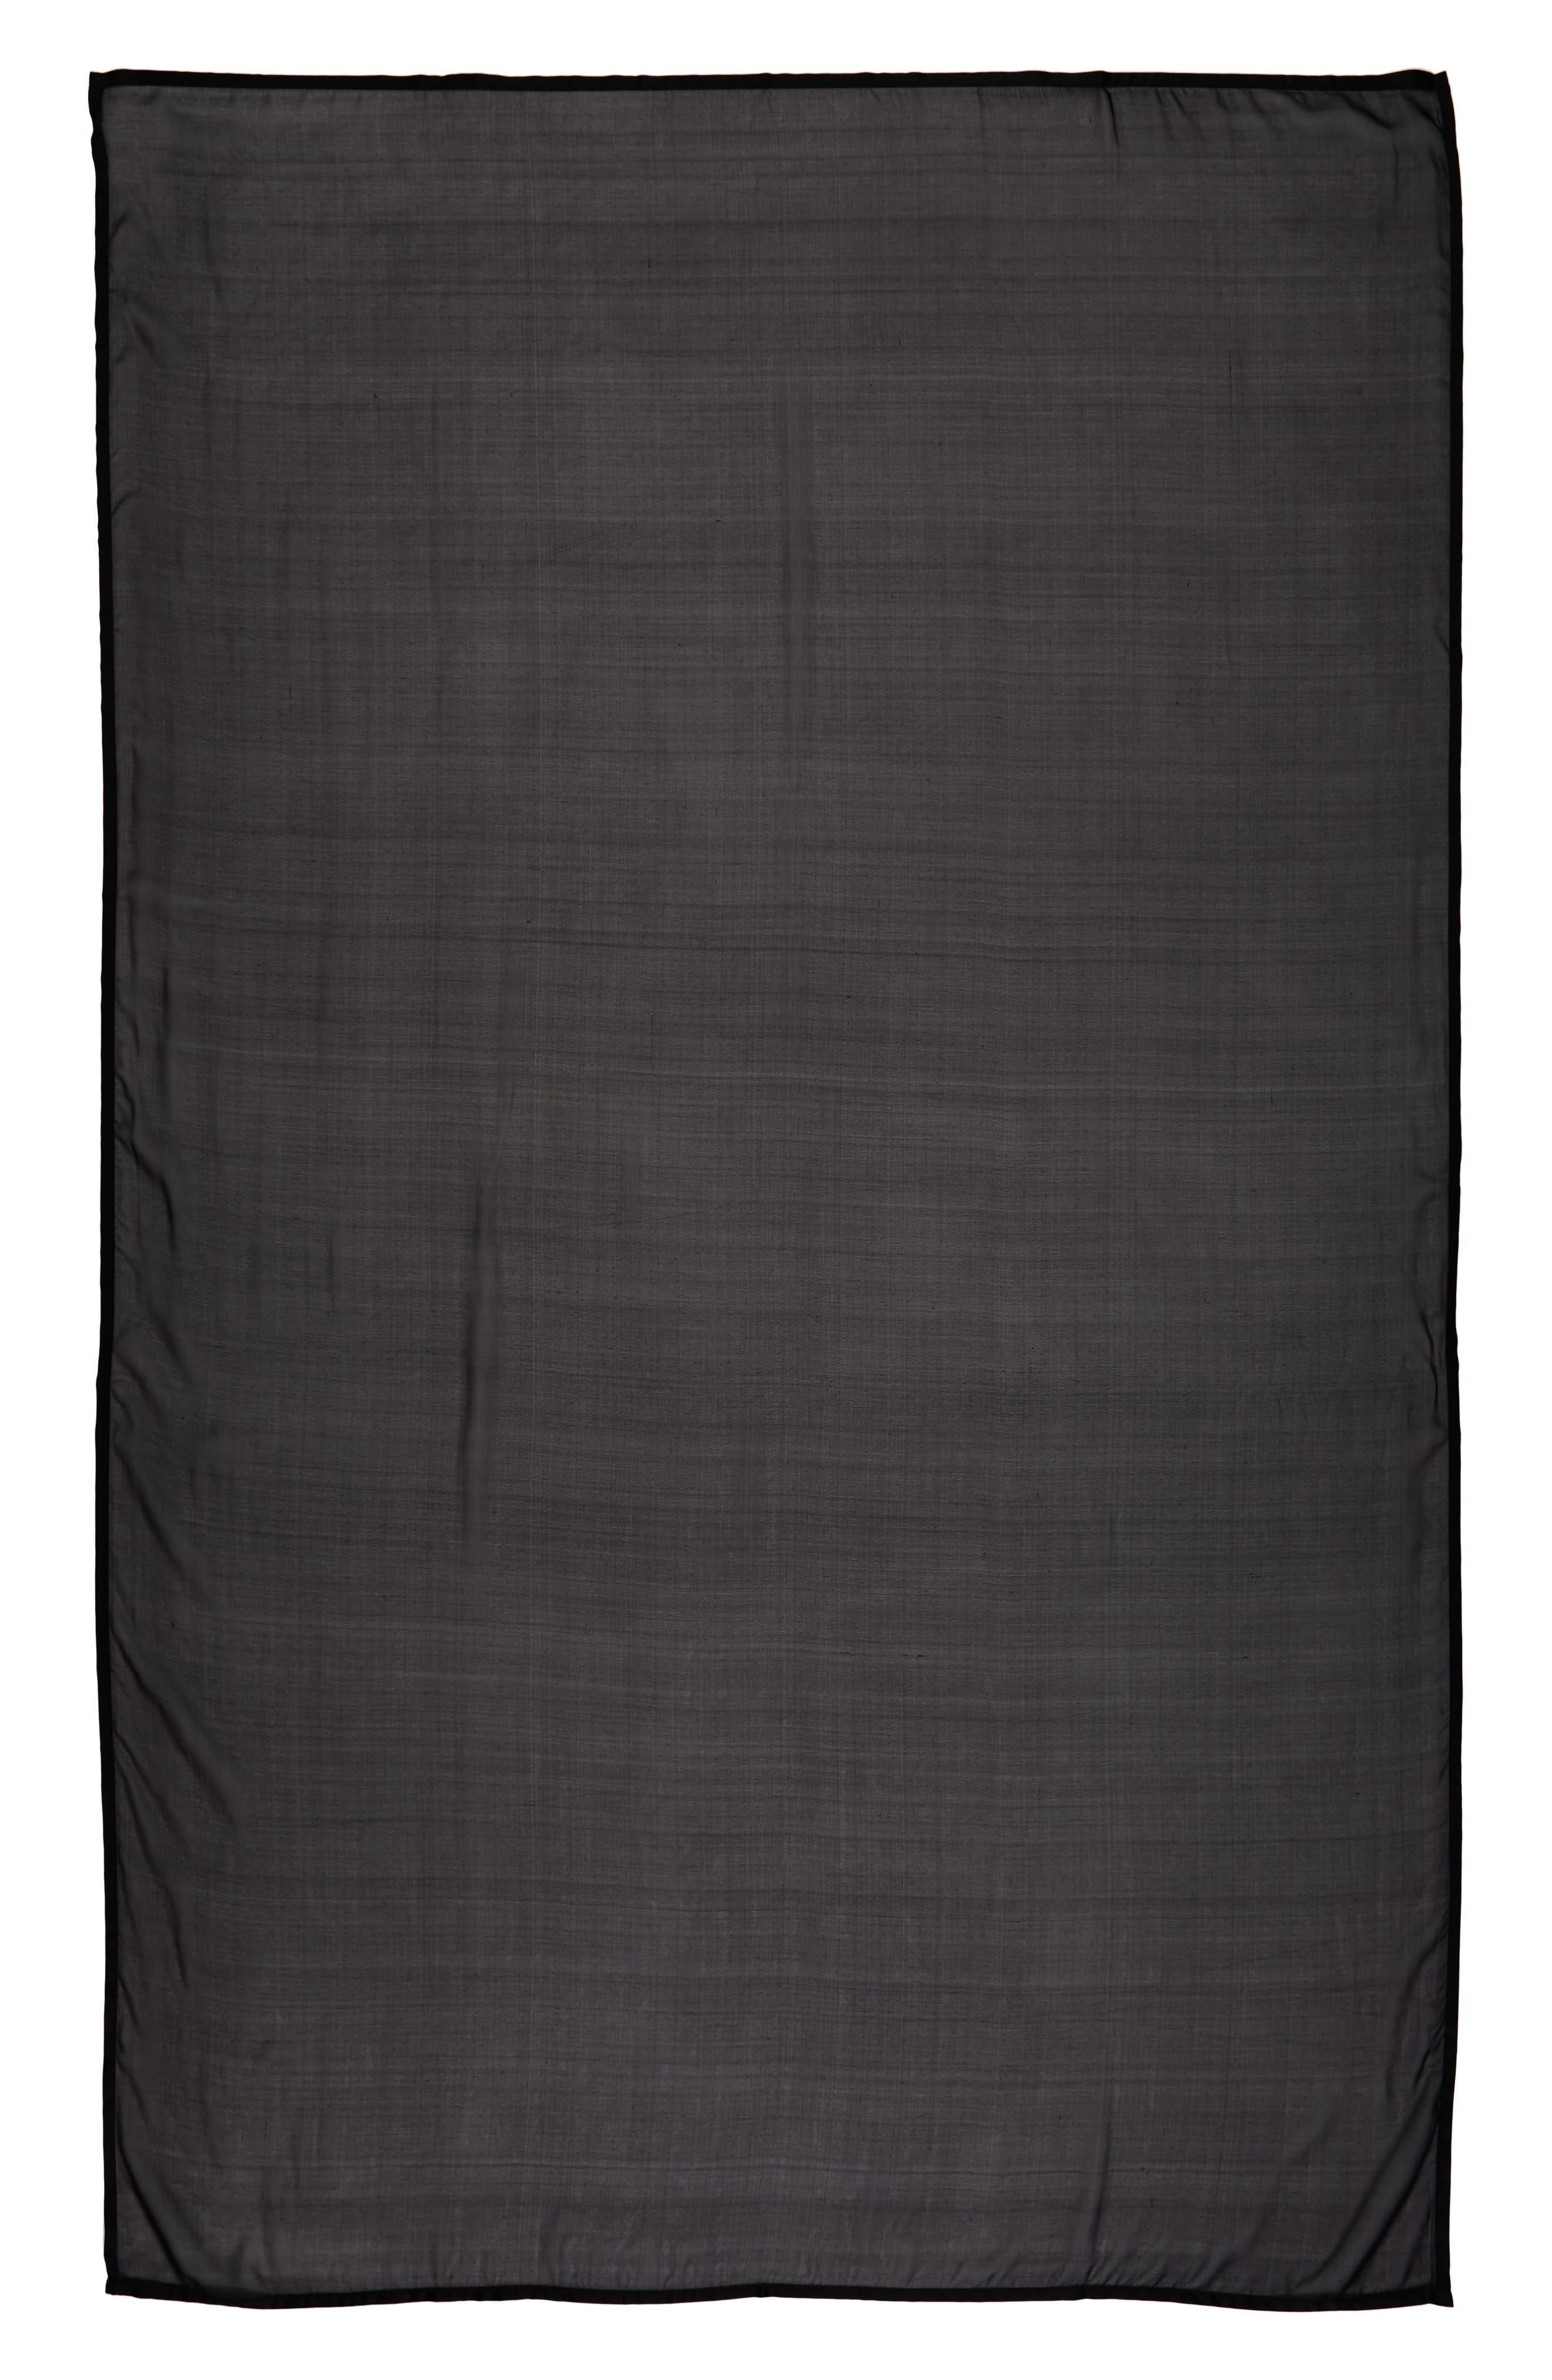 Satin Border Silk Chiffon Scarf,                             Alternate thumbnail 2, color,                             BLACK